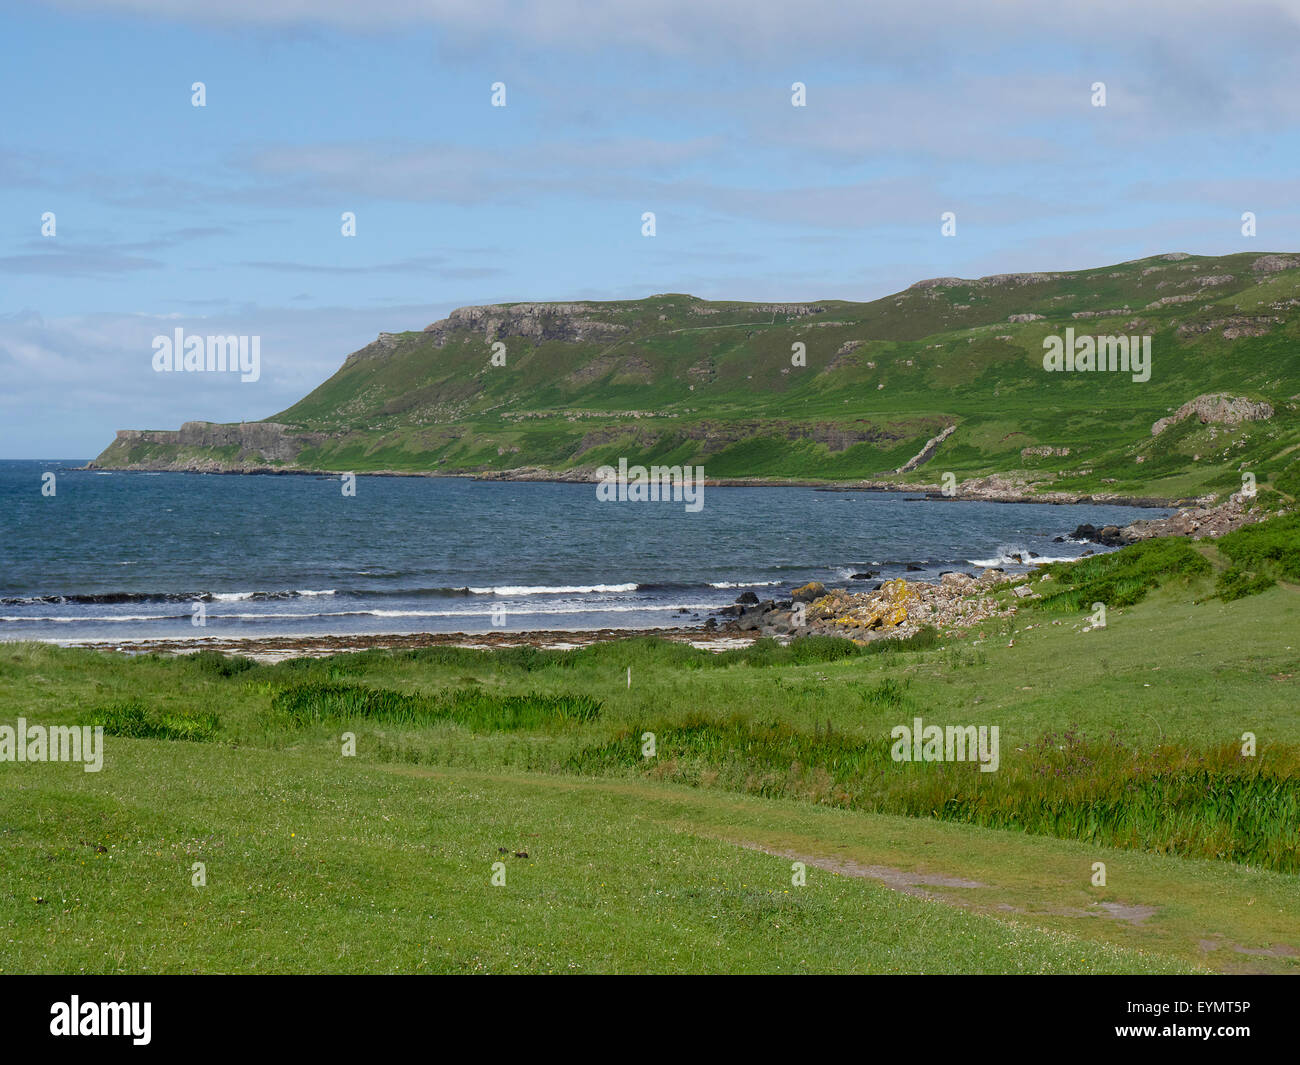 Calgary Bay, Isle of Mull, Scotland, July 2015 - Stock Image